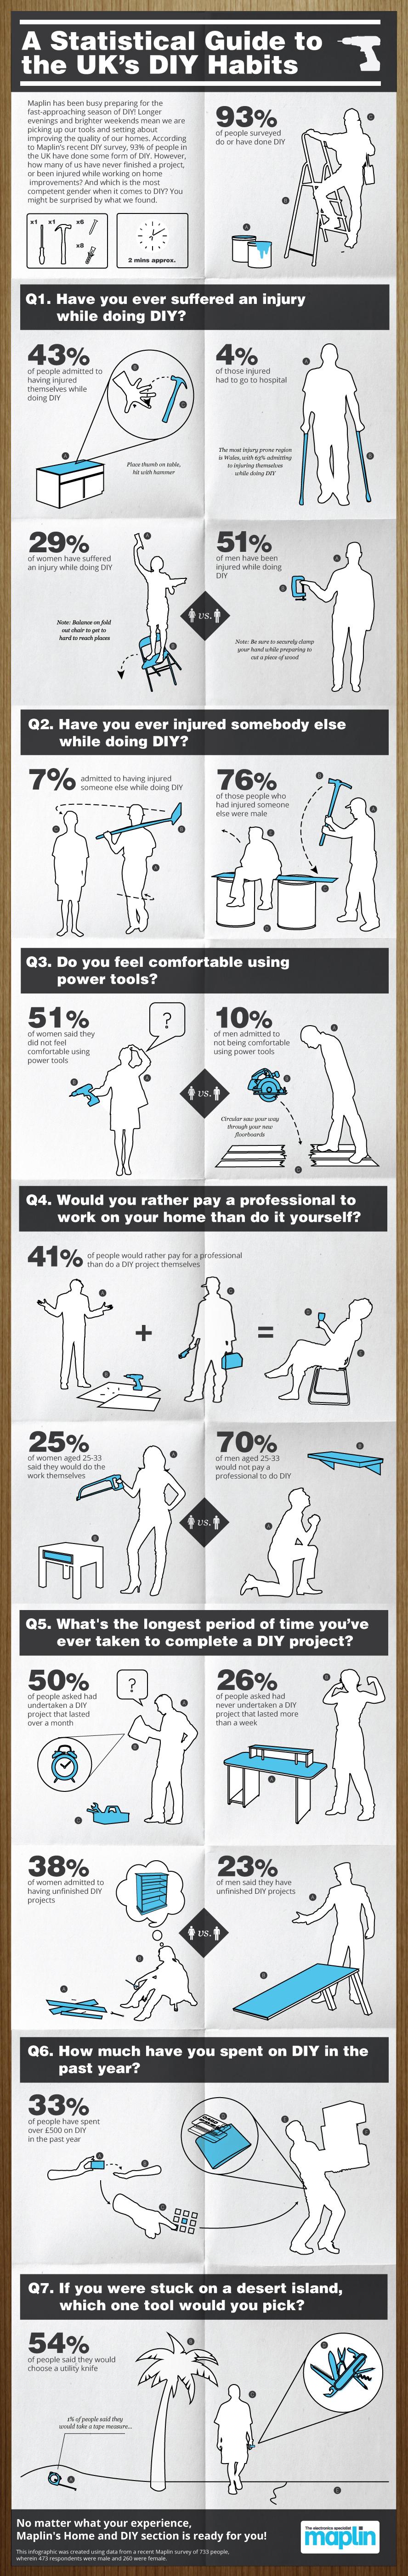 DIY infographic